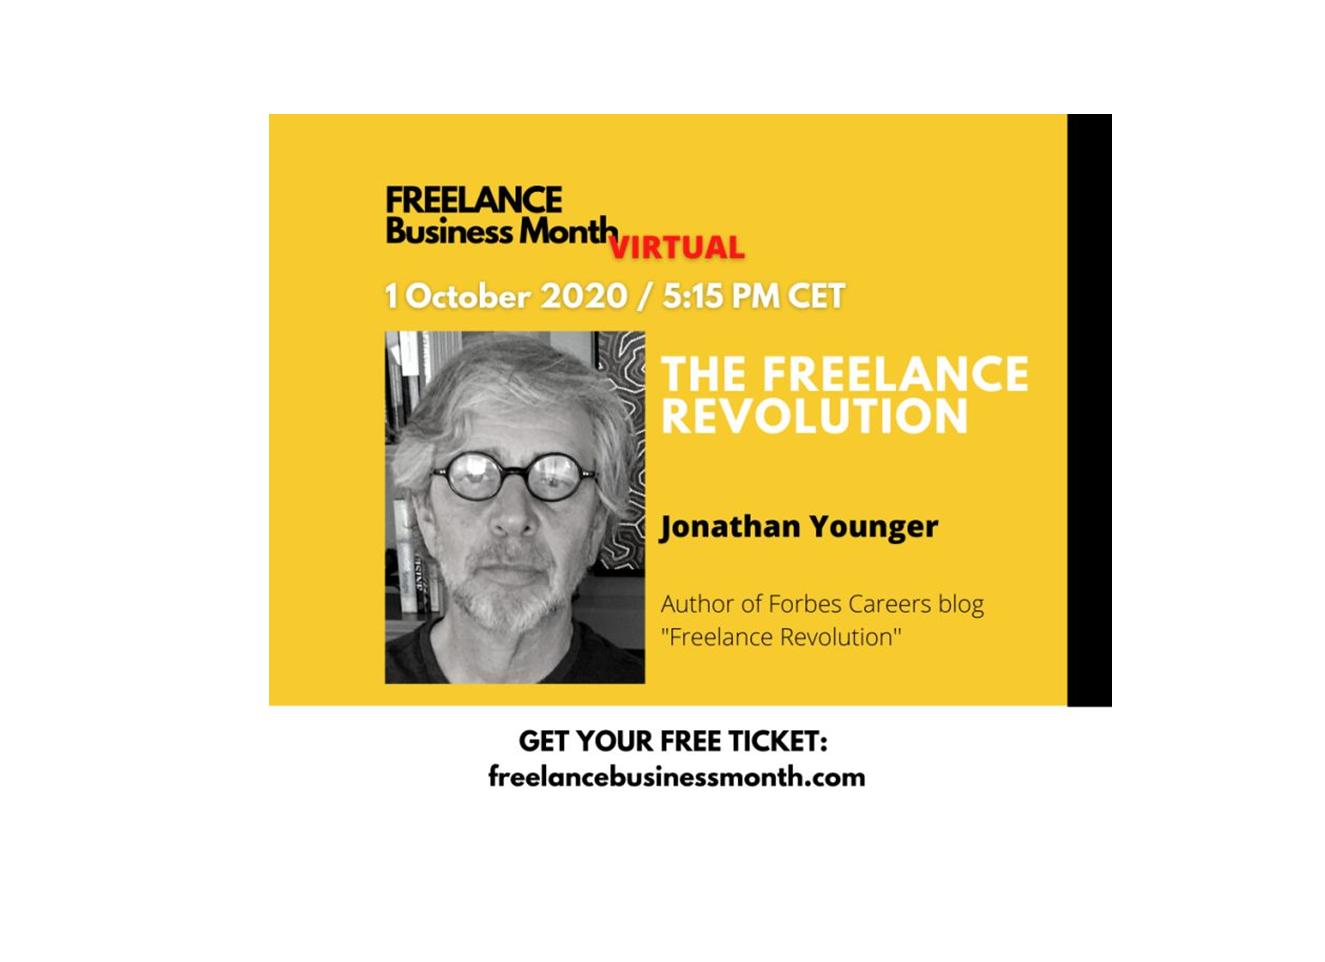 The Freelance Revolution